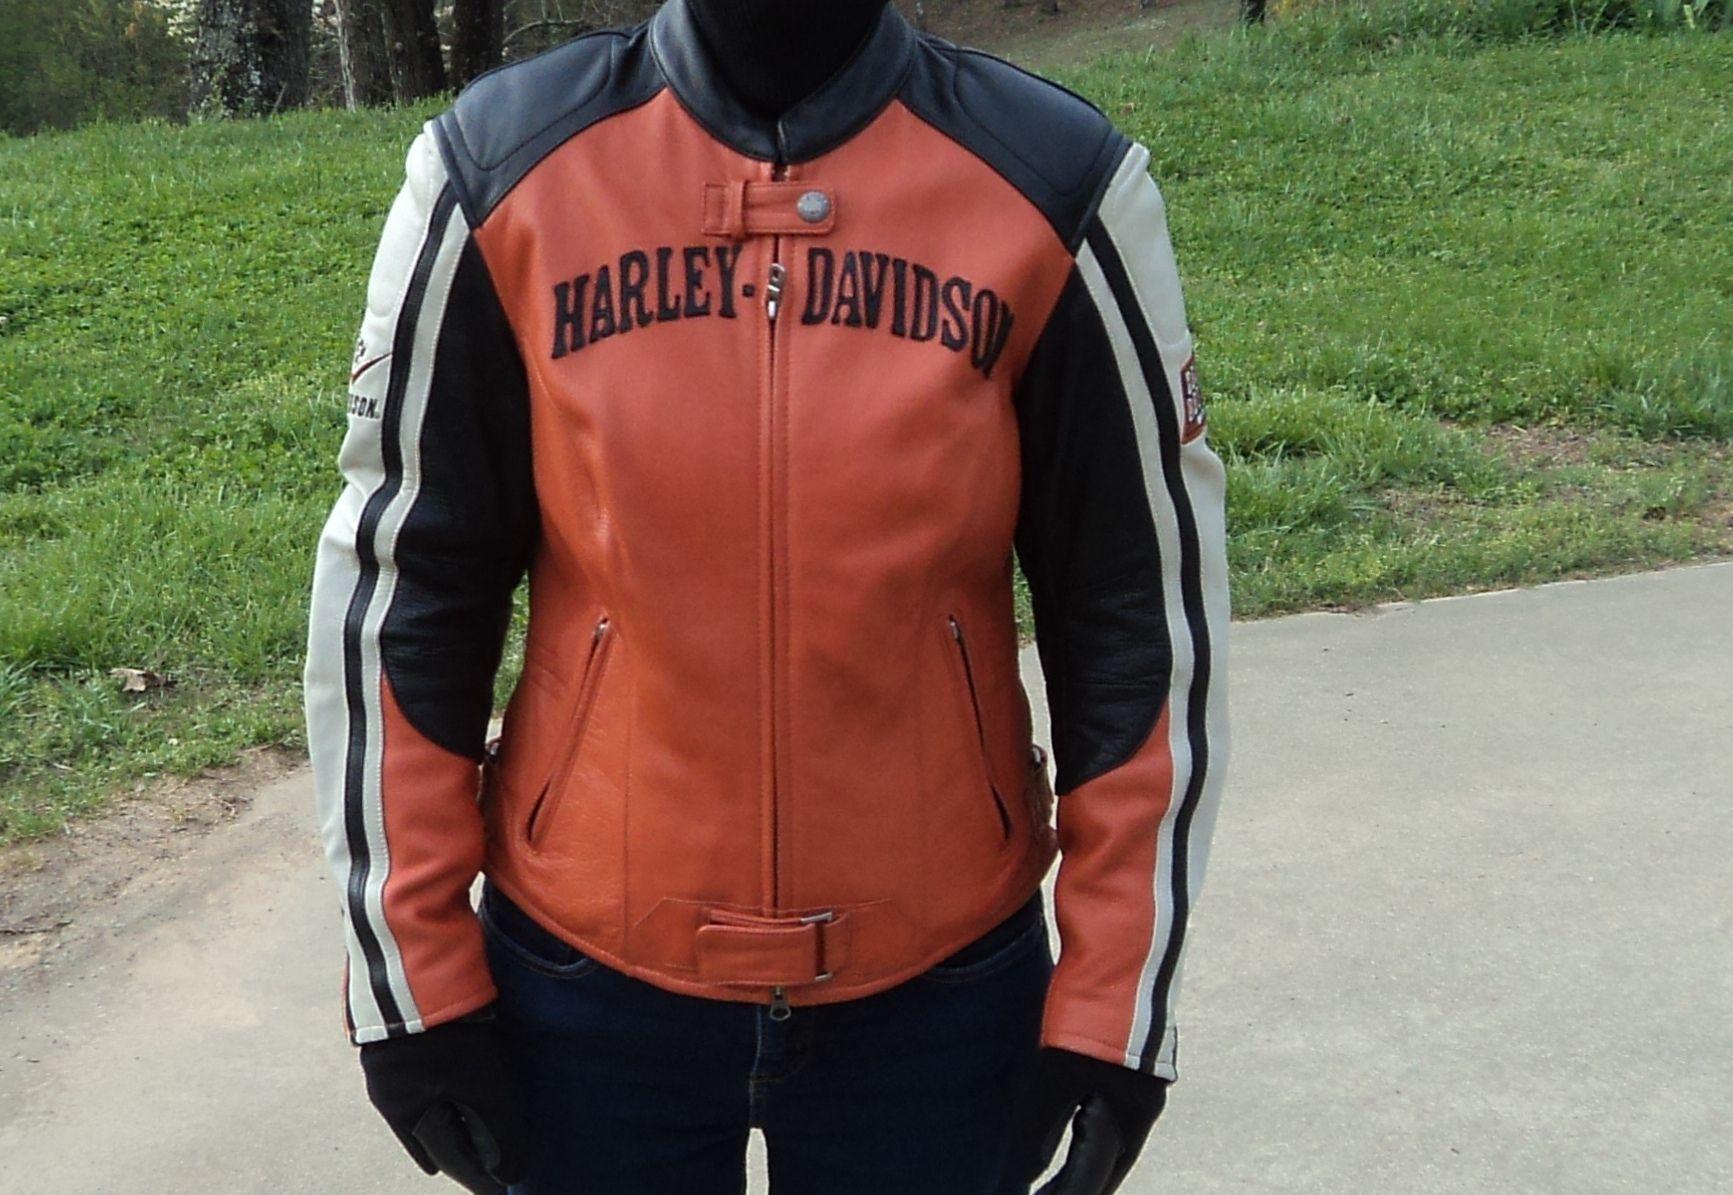 Harley Davidson Black Orange And Cream Leather Jacket Women S Orange Racing Small 150 00 Or Best Off Cream Leather Jacket Leather Jackets Women Racing Jacket [ 1195 x 1733 Pixel ]